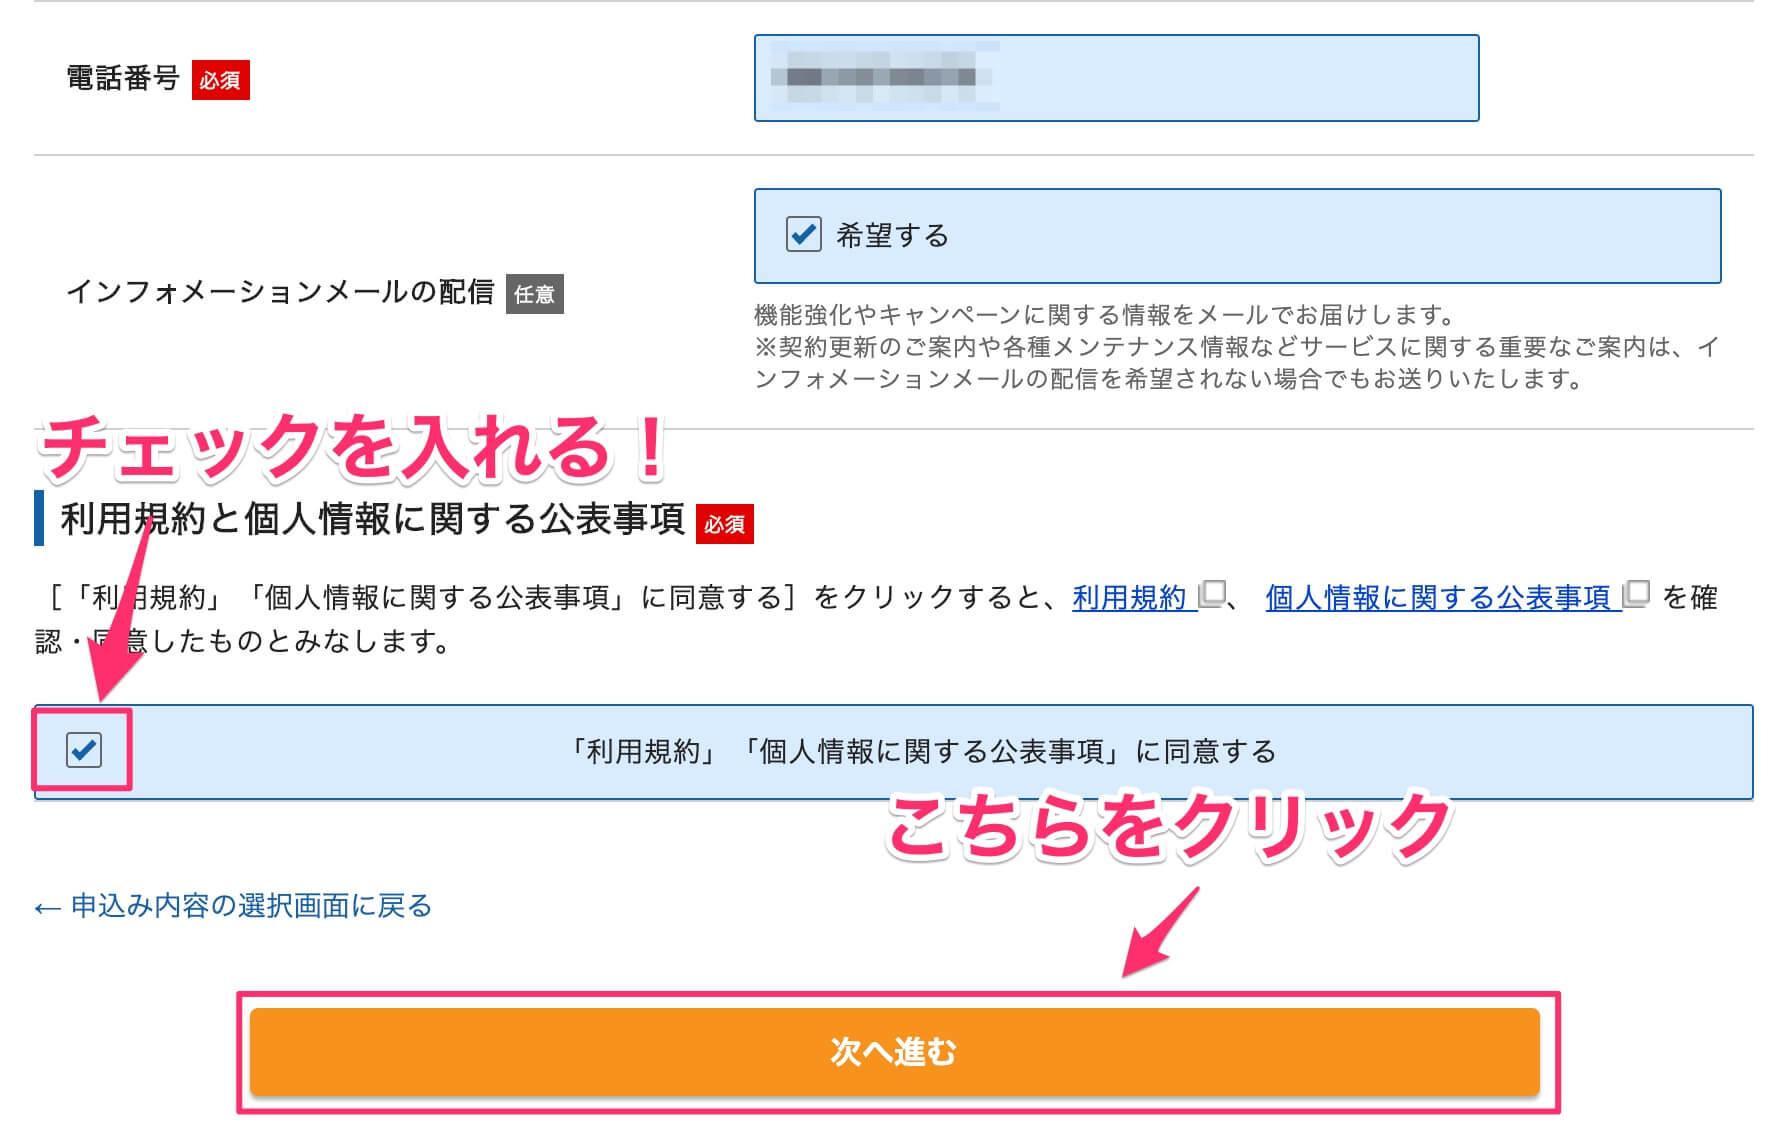 『Xserverアカウントに登録するお客様情報を入力』